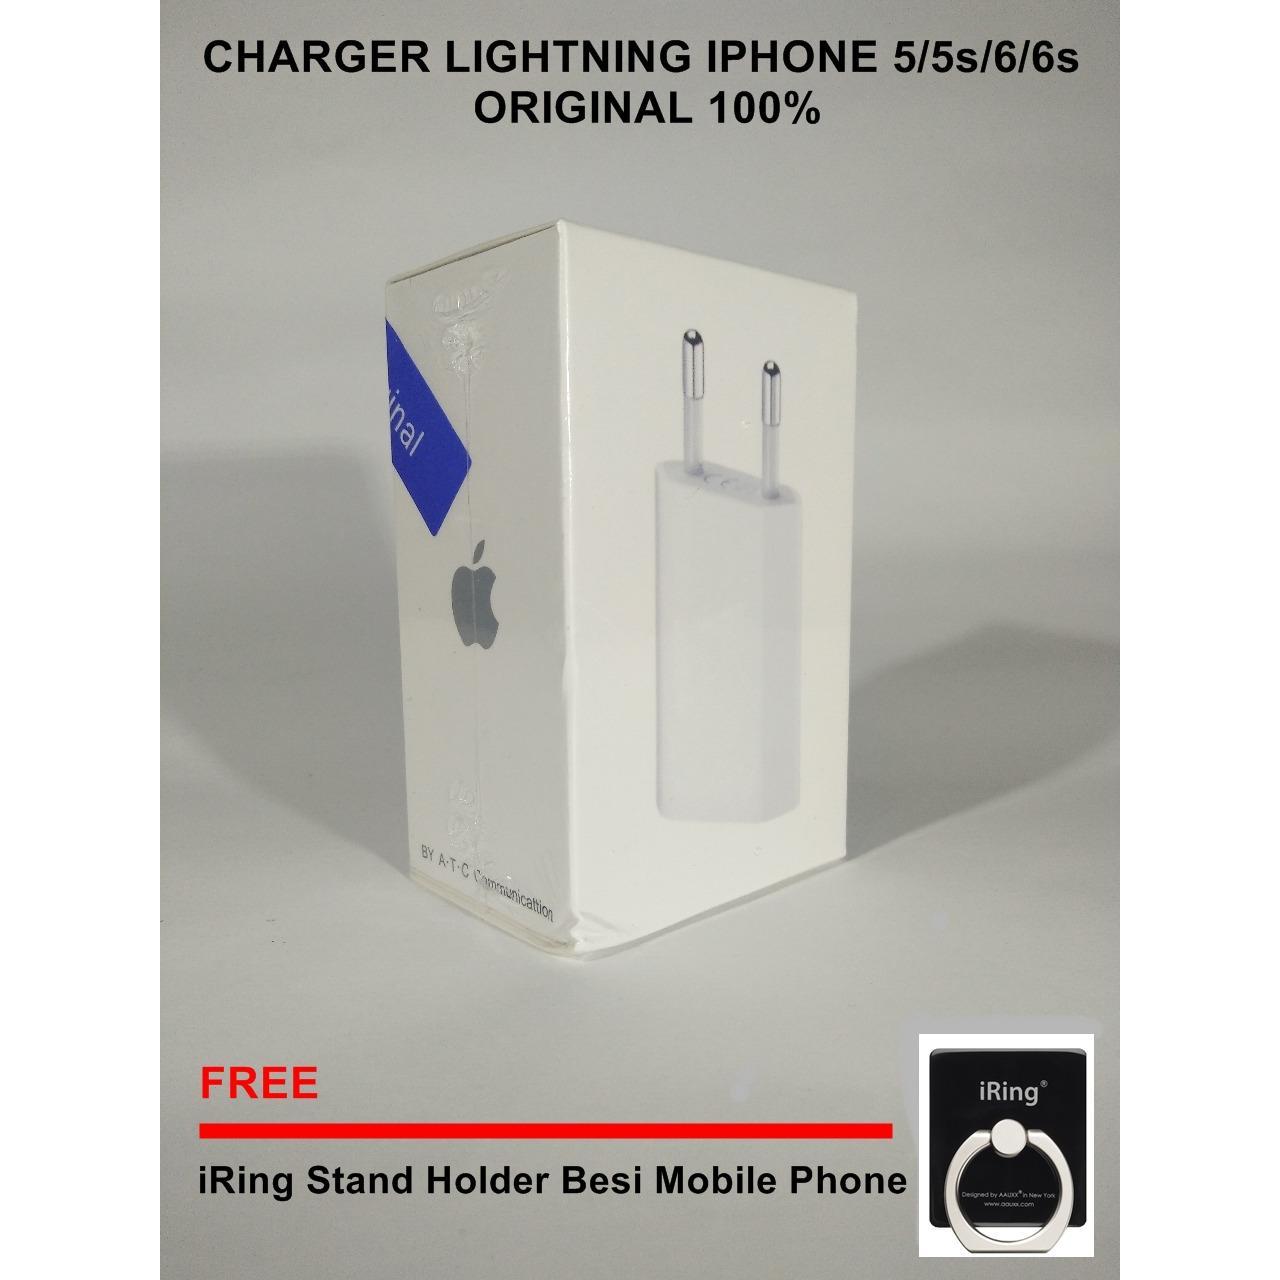 Harga Gold Store Charger Kabel Iphone 5 5S 6 6 Original Lightning Baru